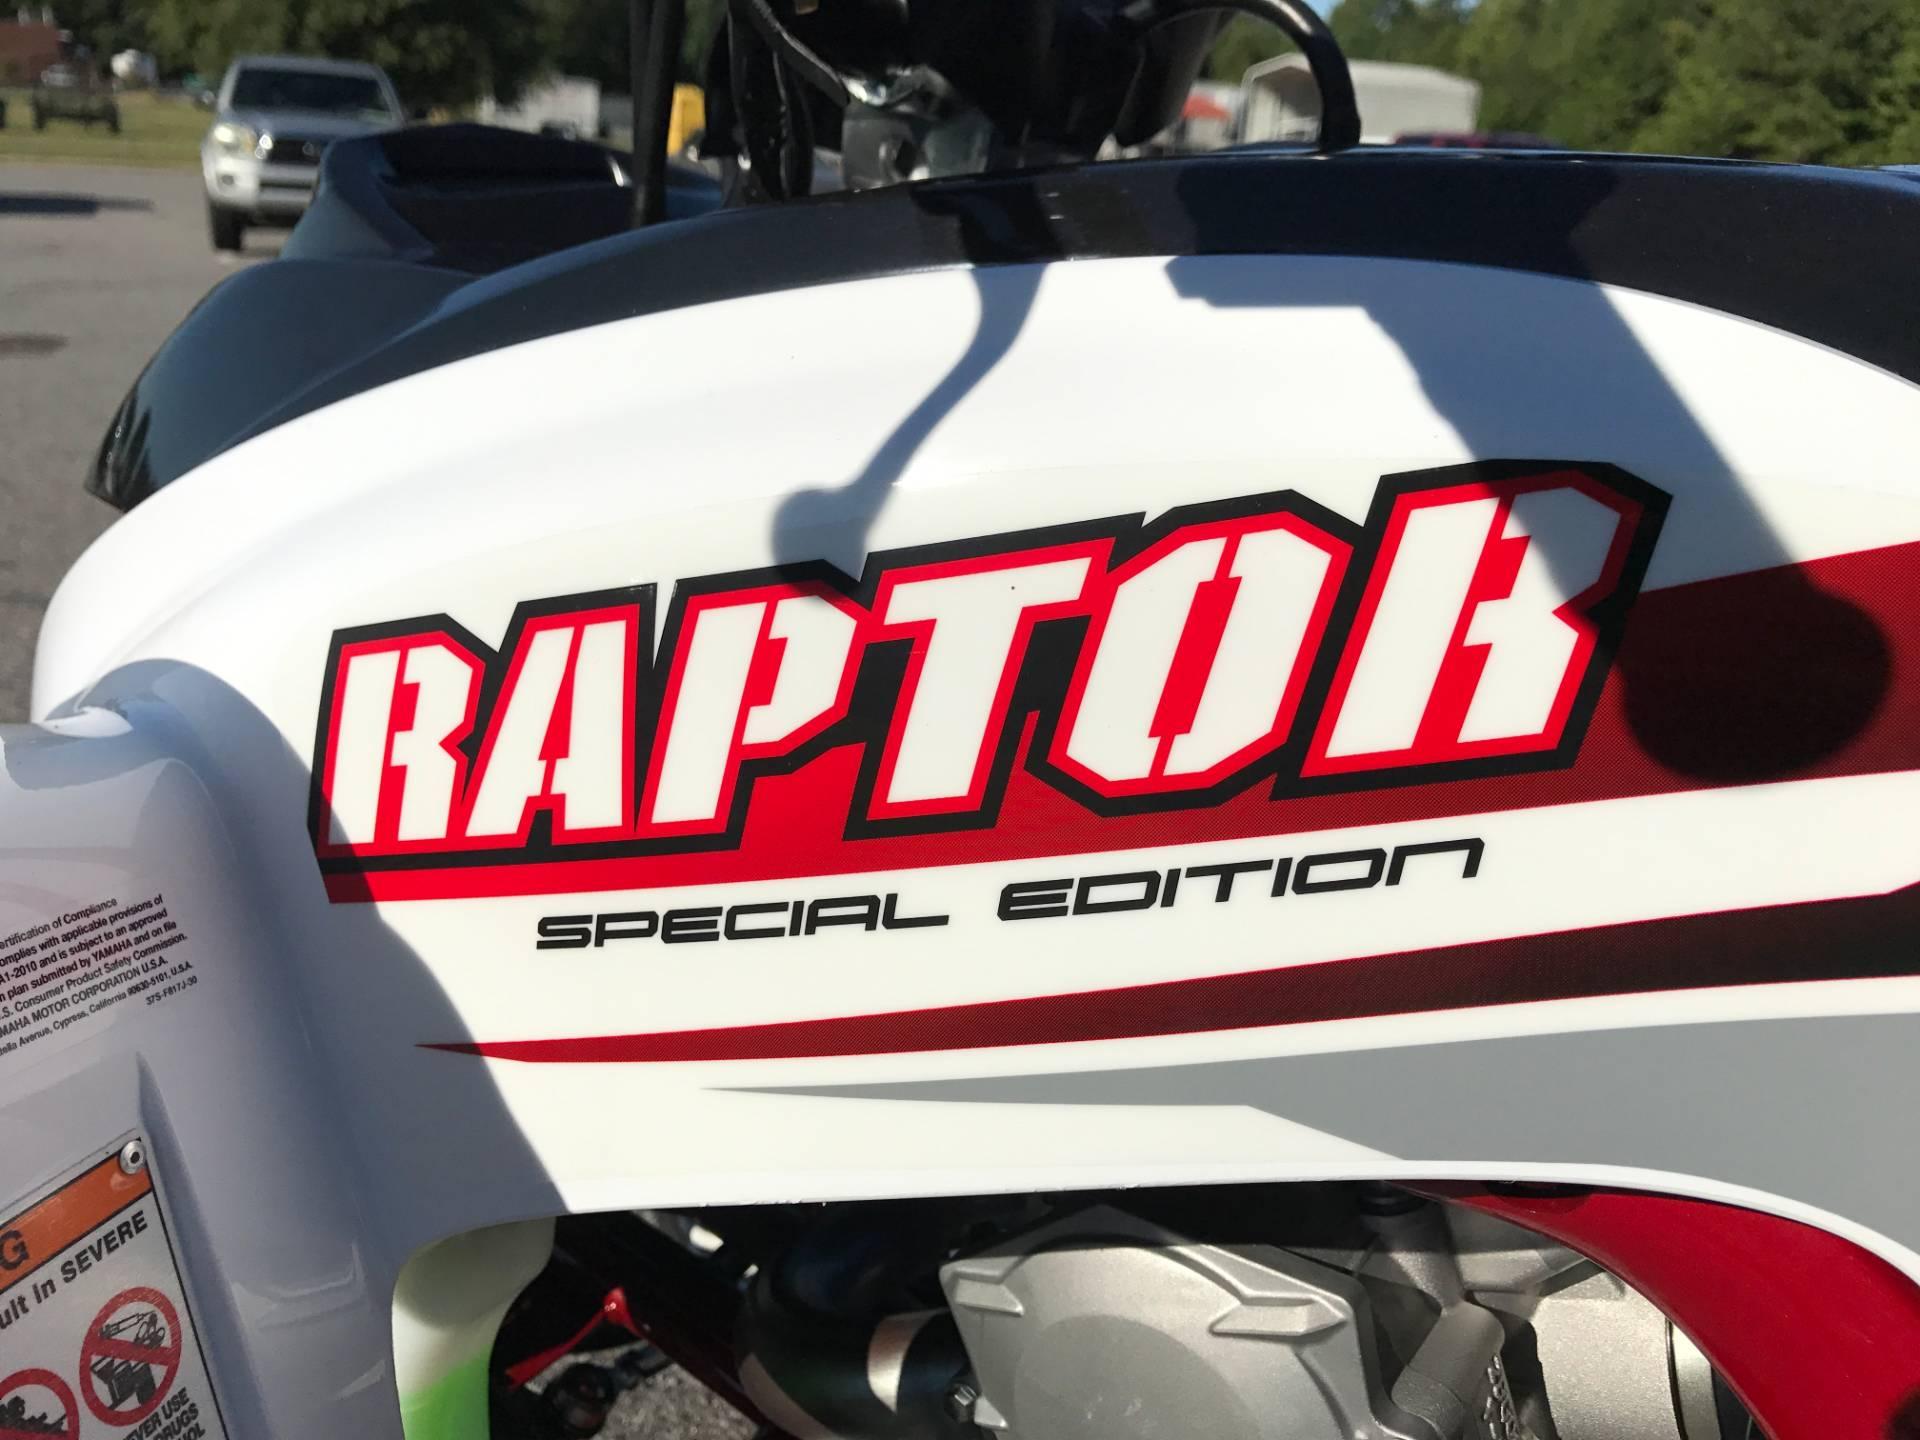 2018 Yamaha Raptor 700R SE in Greenville, North Carolina